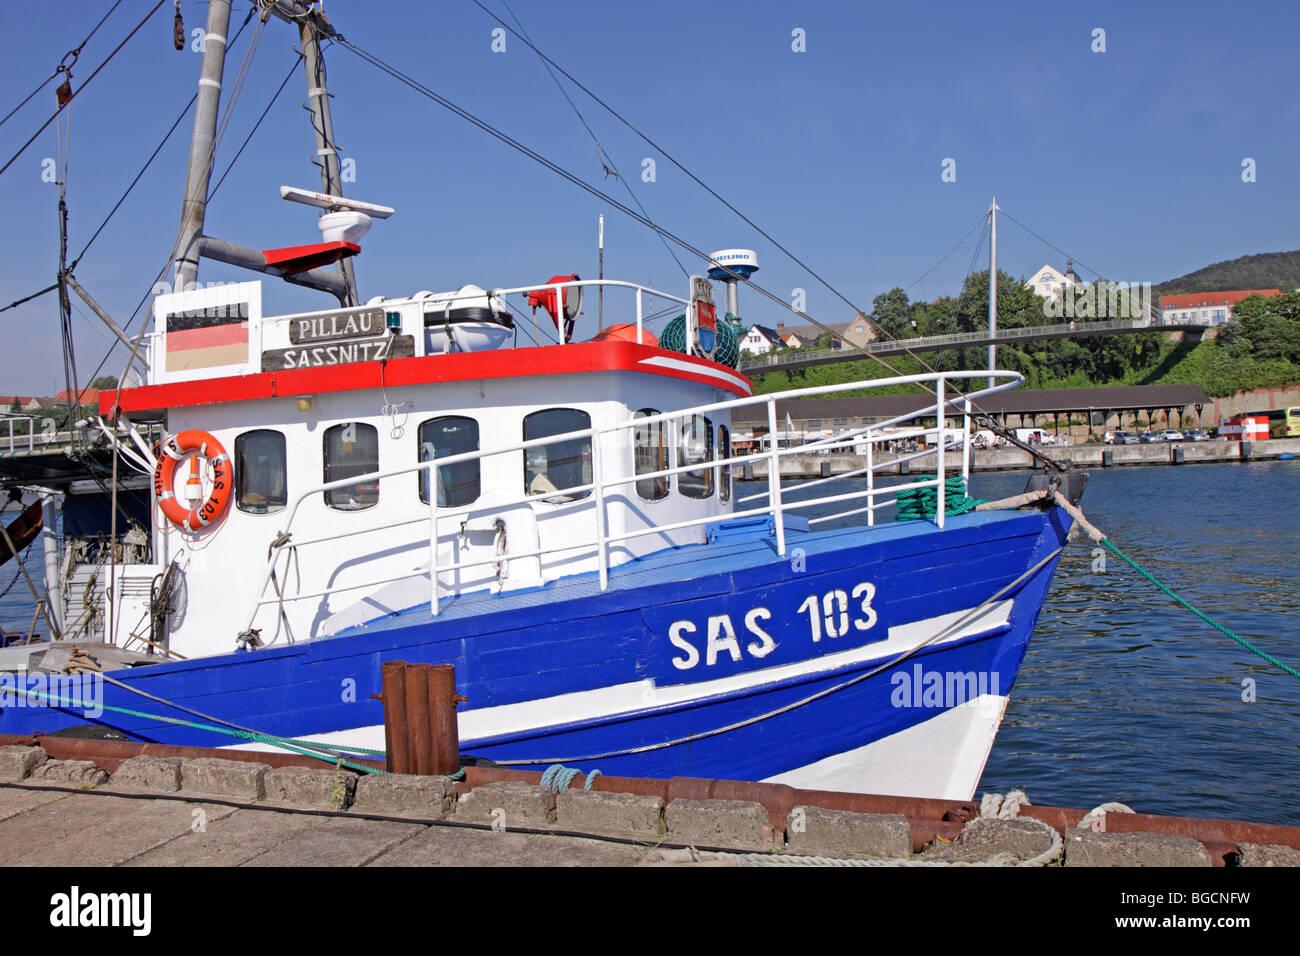 fishing smack at the harbour of Sassnitz, Ruegen Island, Mecklenburg-West Pomerania, Germany - Stock Image